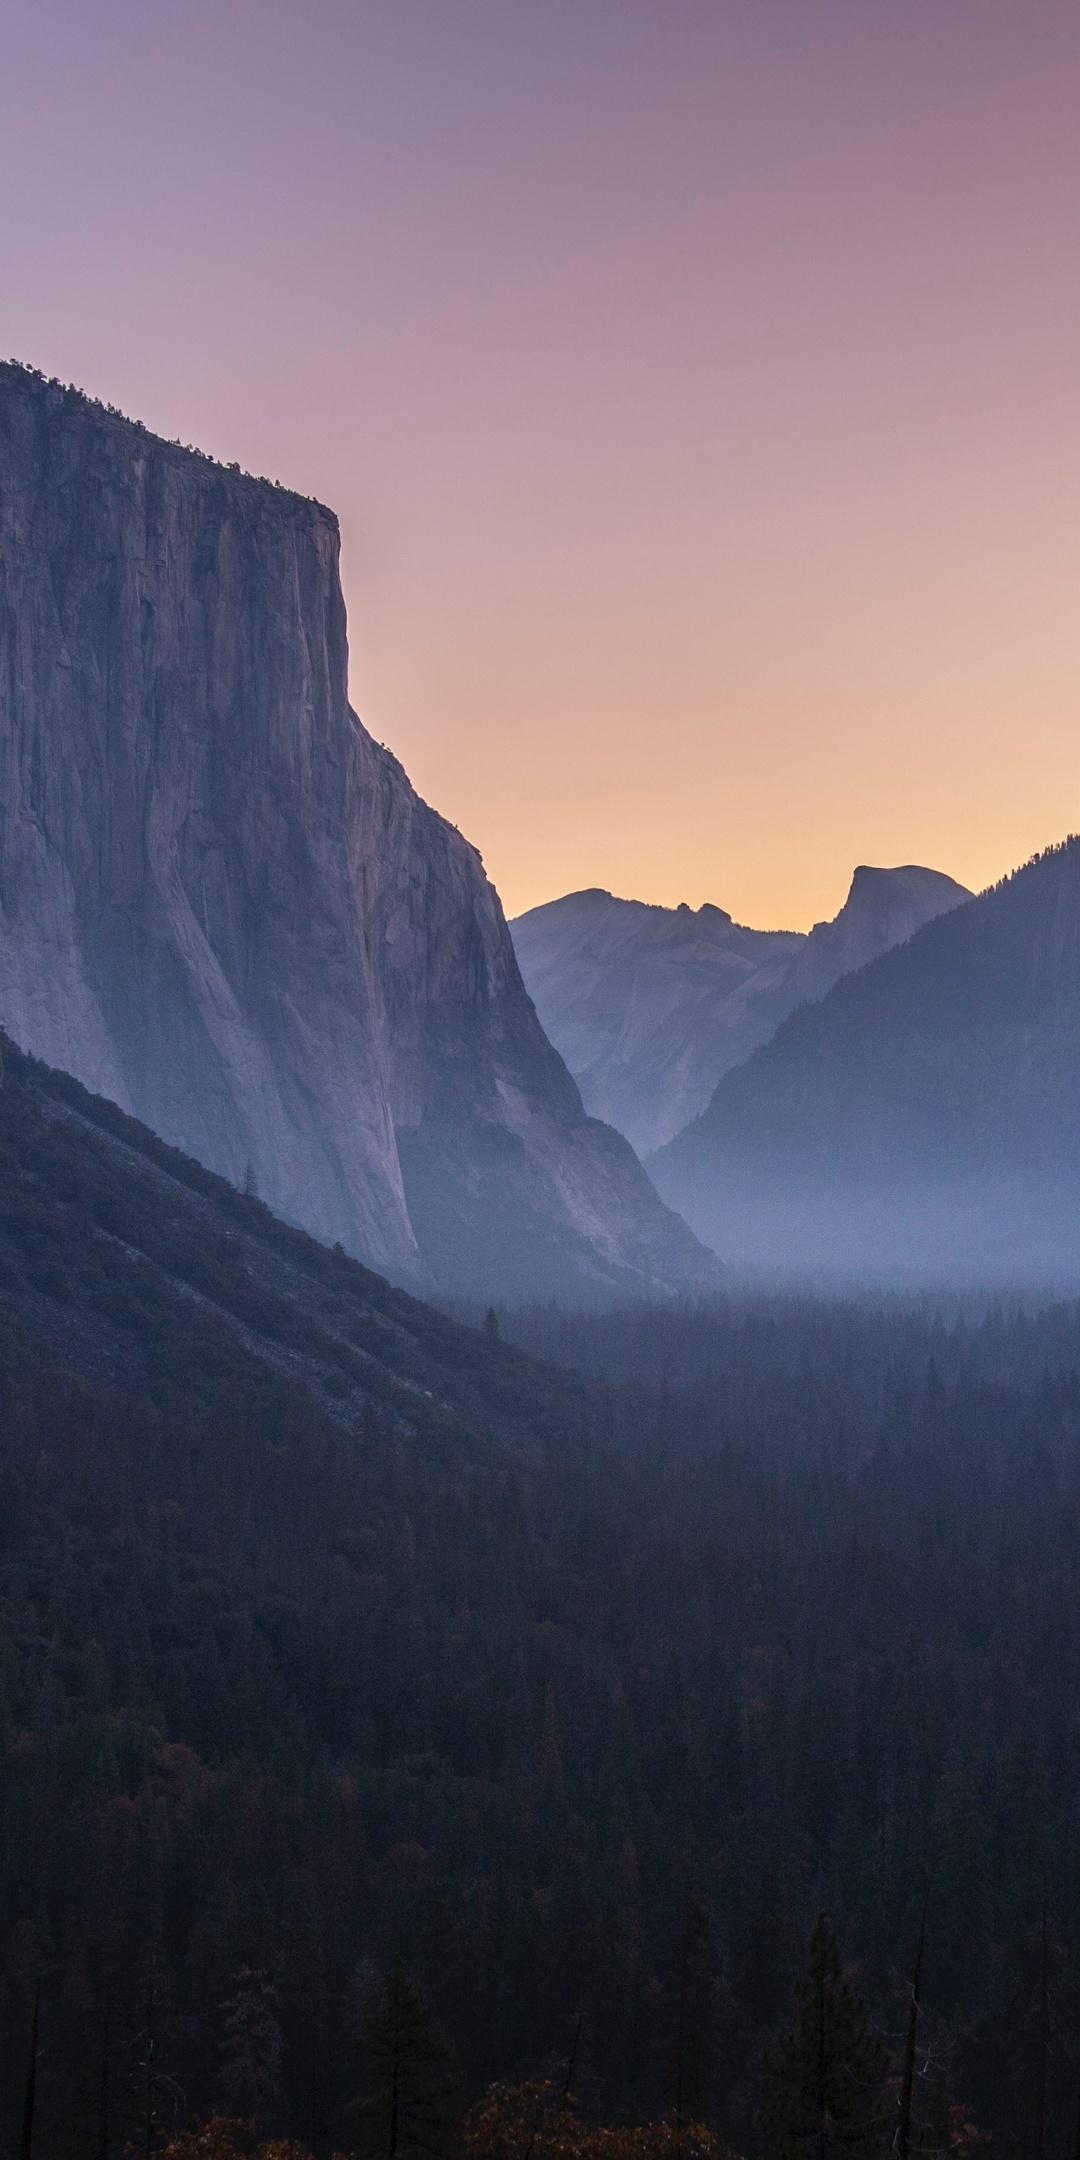 rock-mountains-cliff-5k-zx.jpg